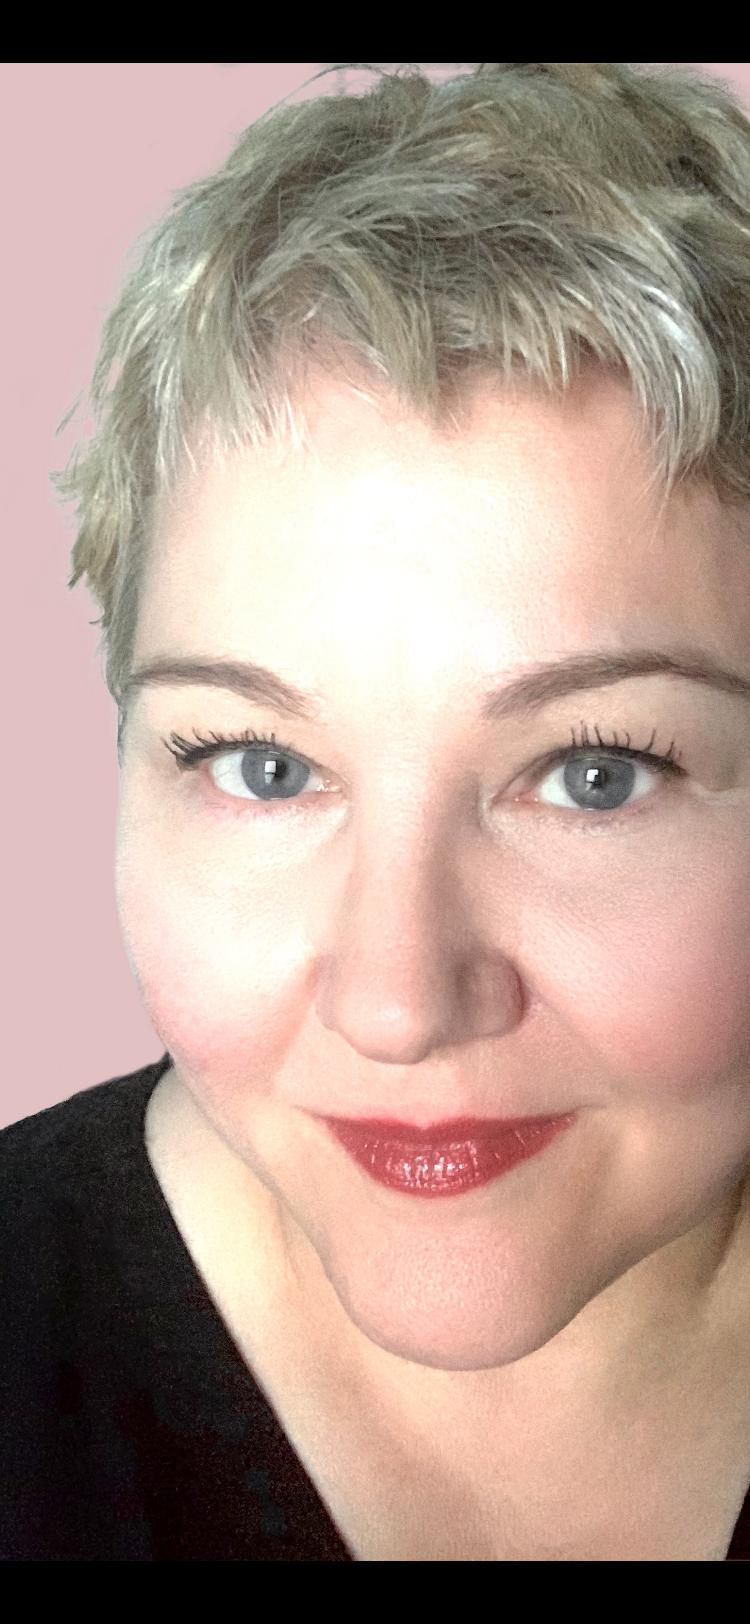 Selfie of Angela Jackson, author of The Darlings